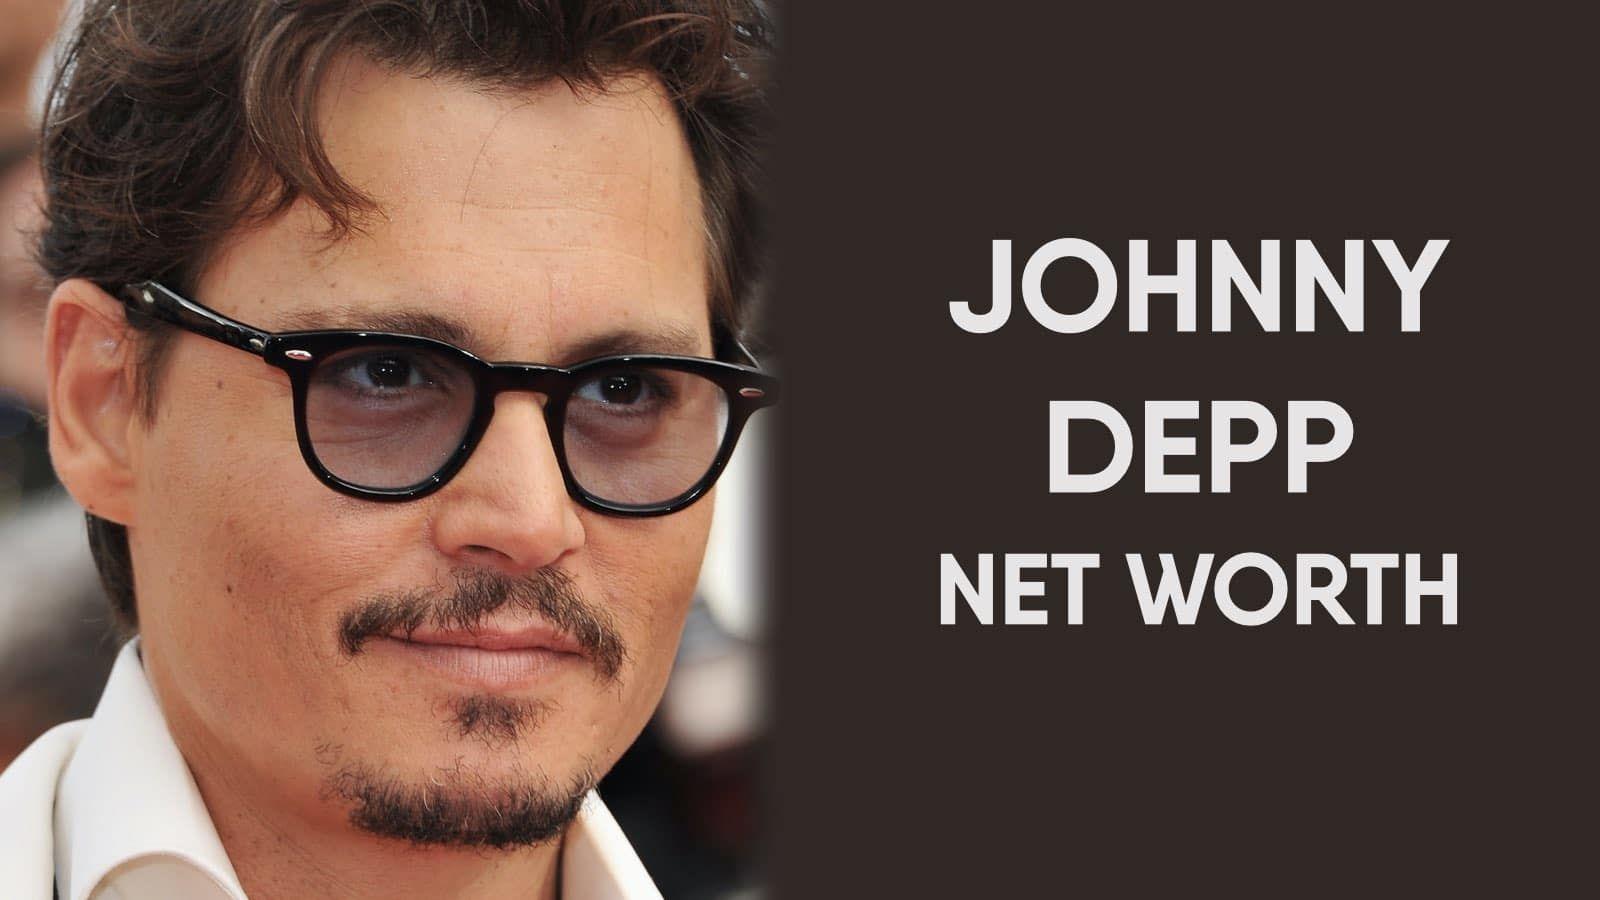 Johnny Depp Net Worth In 2020 Johnny Depp Net Worth Johnny Depp American Actors